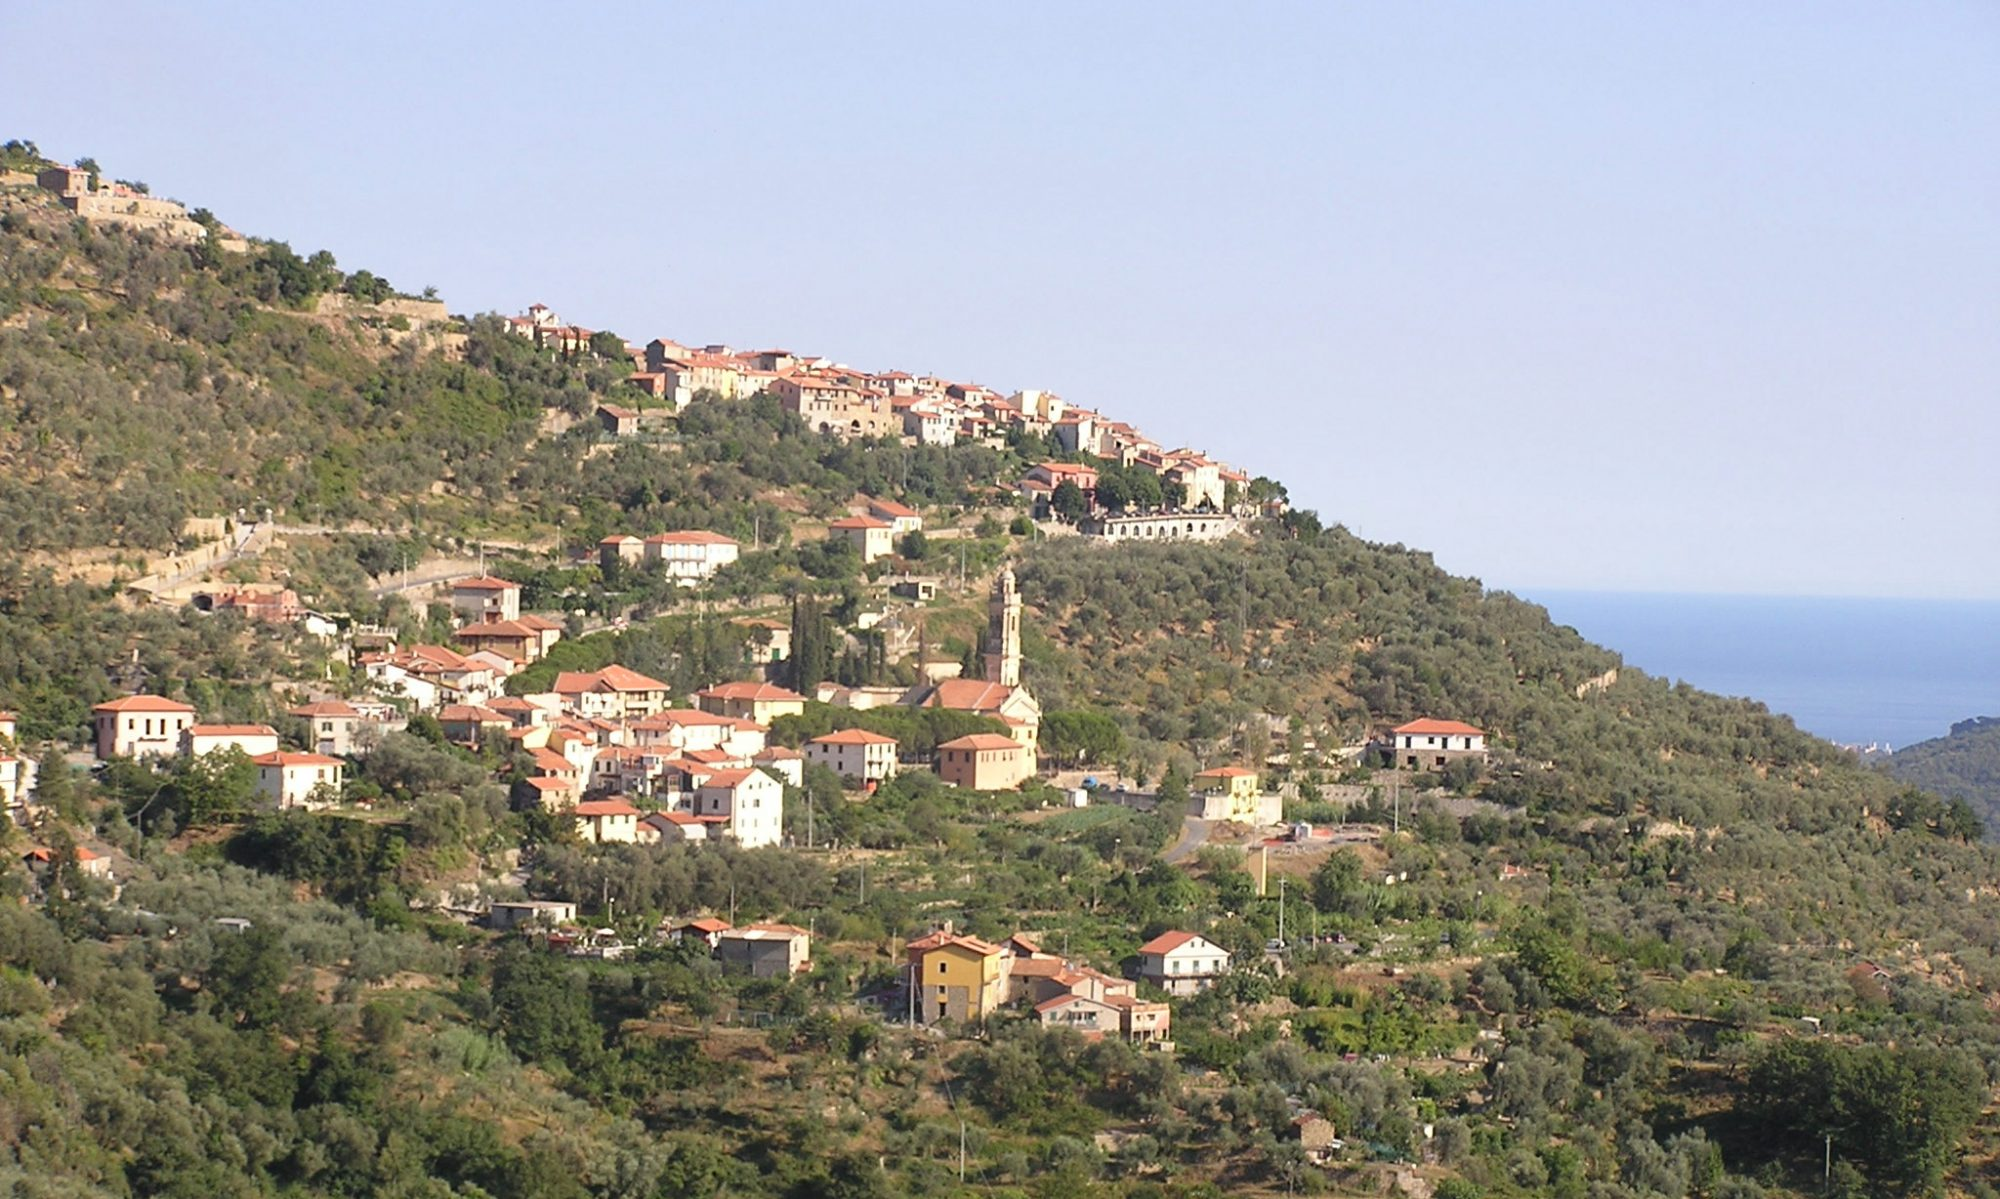 Ferienhaus Casa Rossa - Italien - Riviera - Ligurien